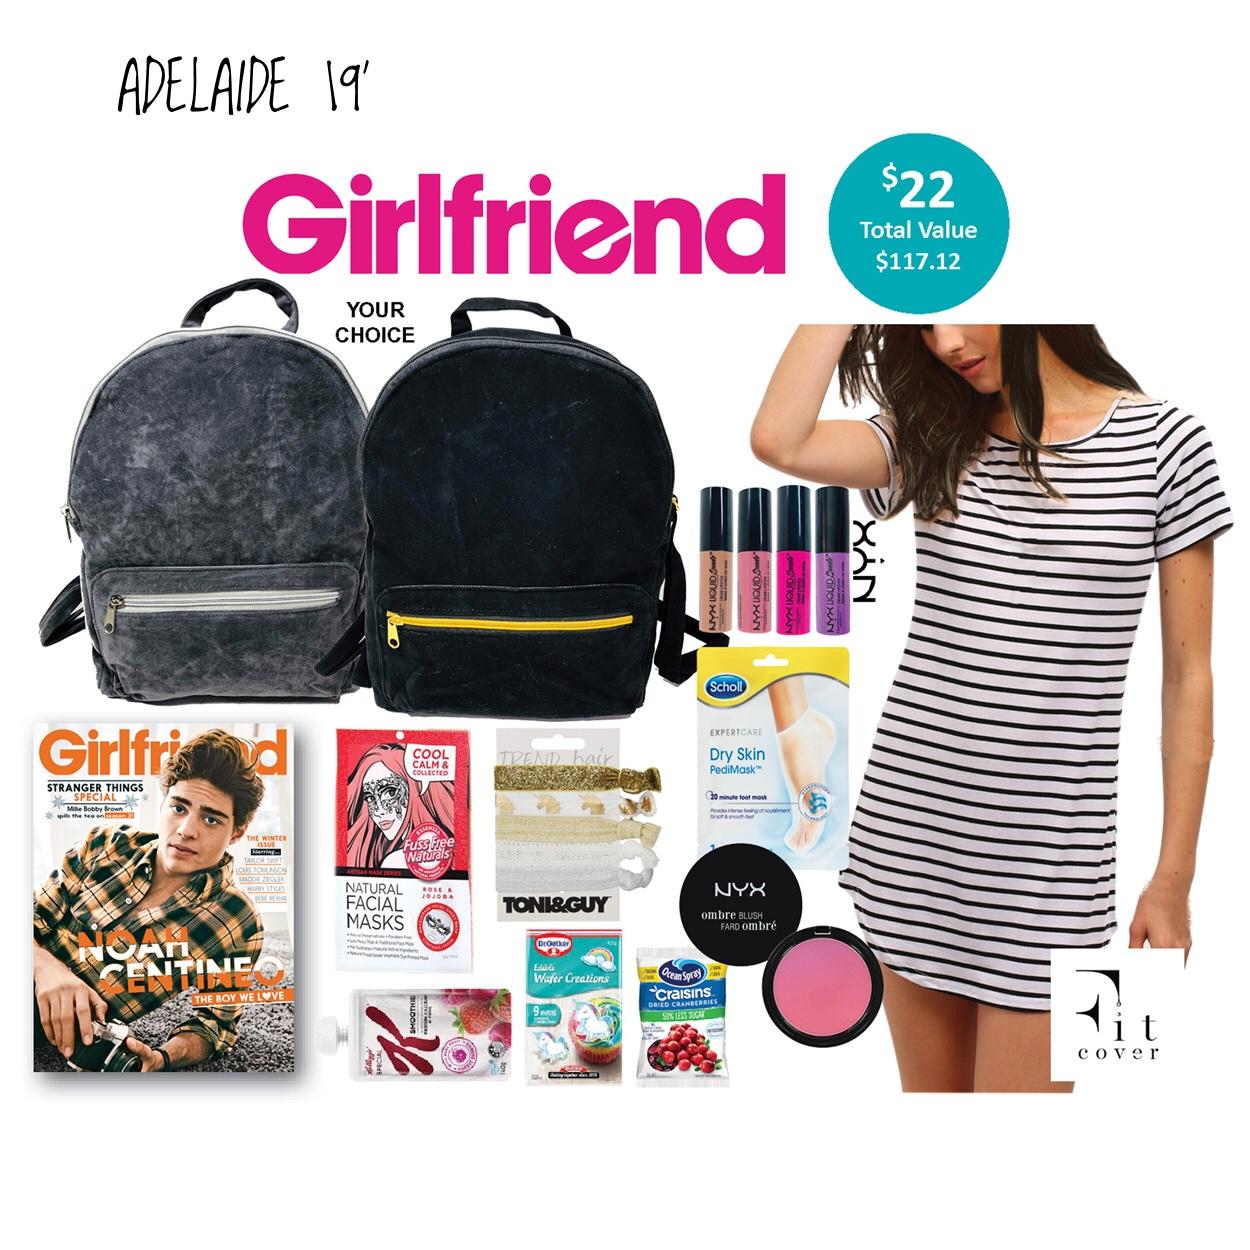 Girlfriend - Adelaide 19'